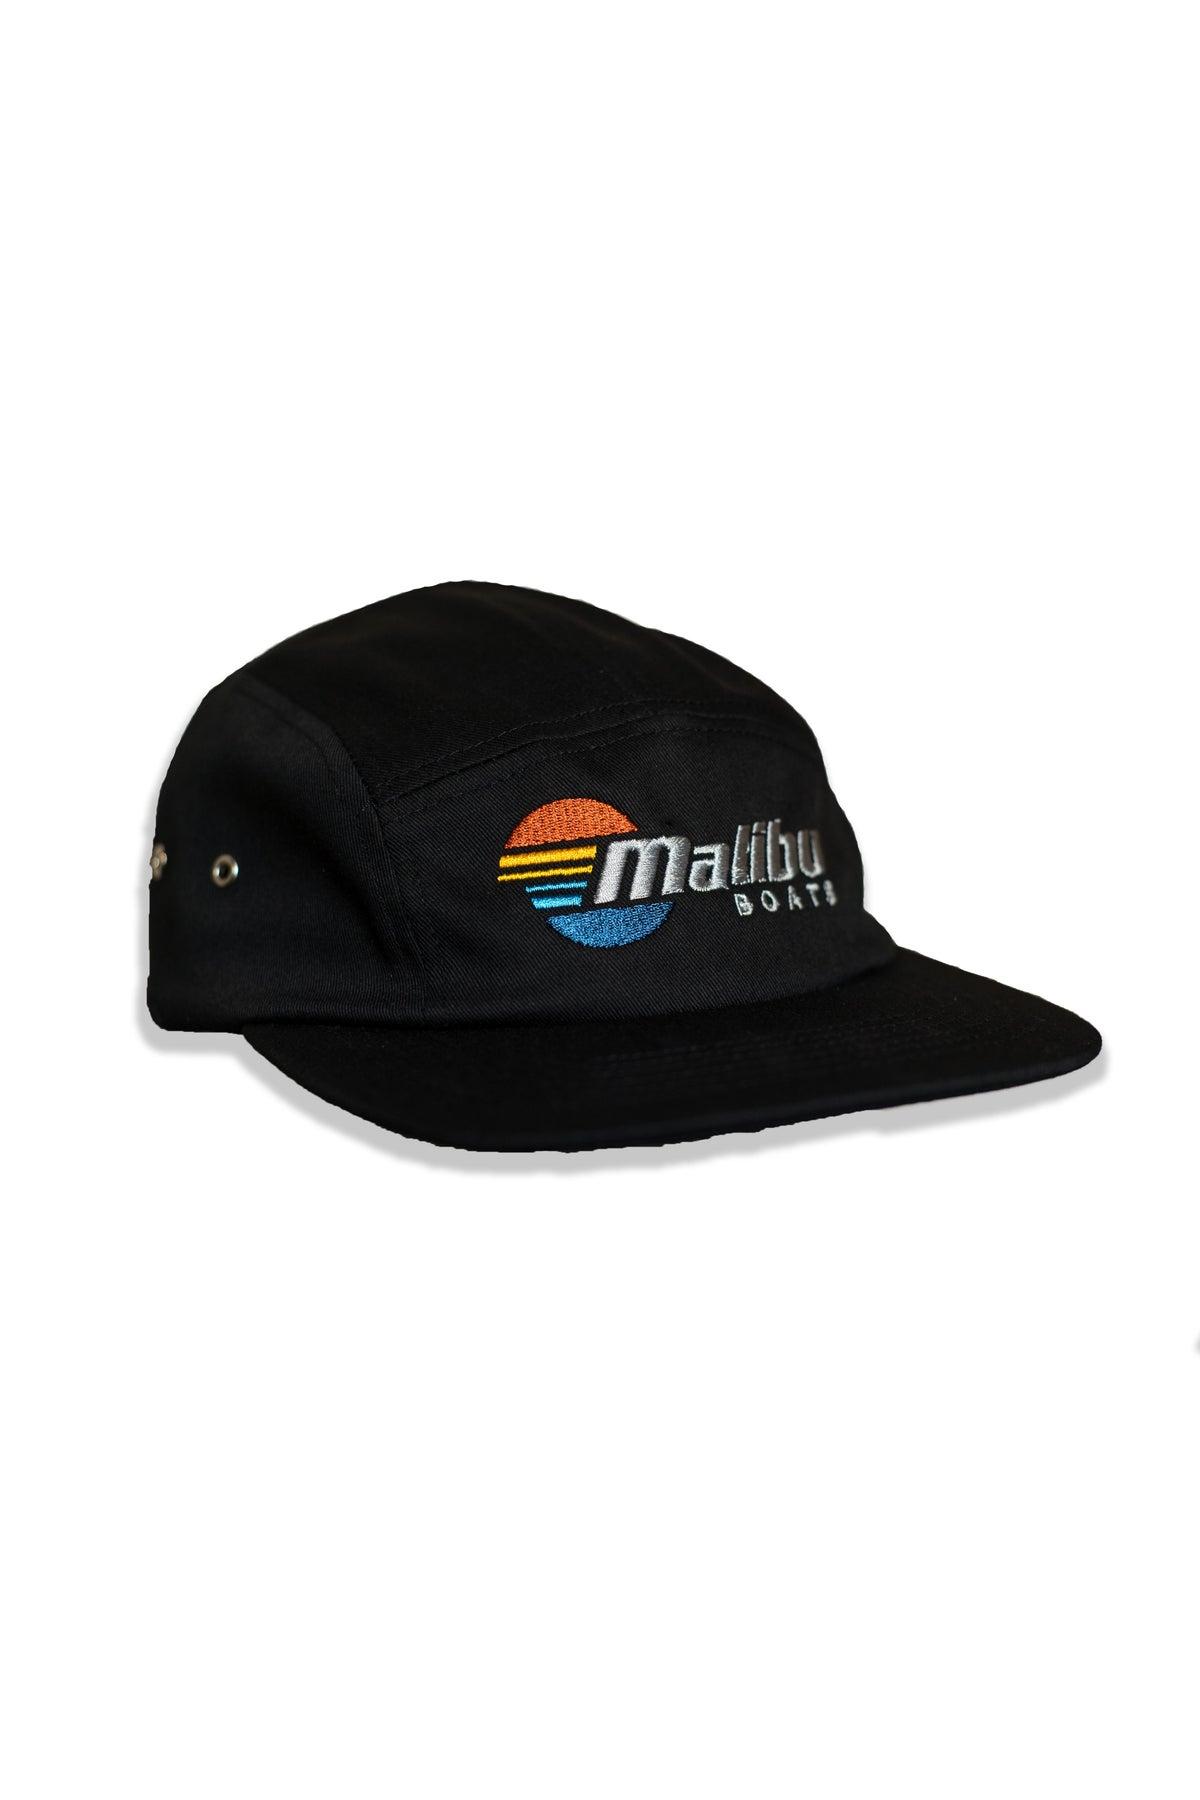 Image of Malibu Five Panel Cap